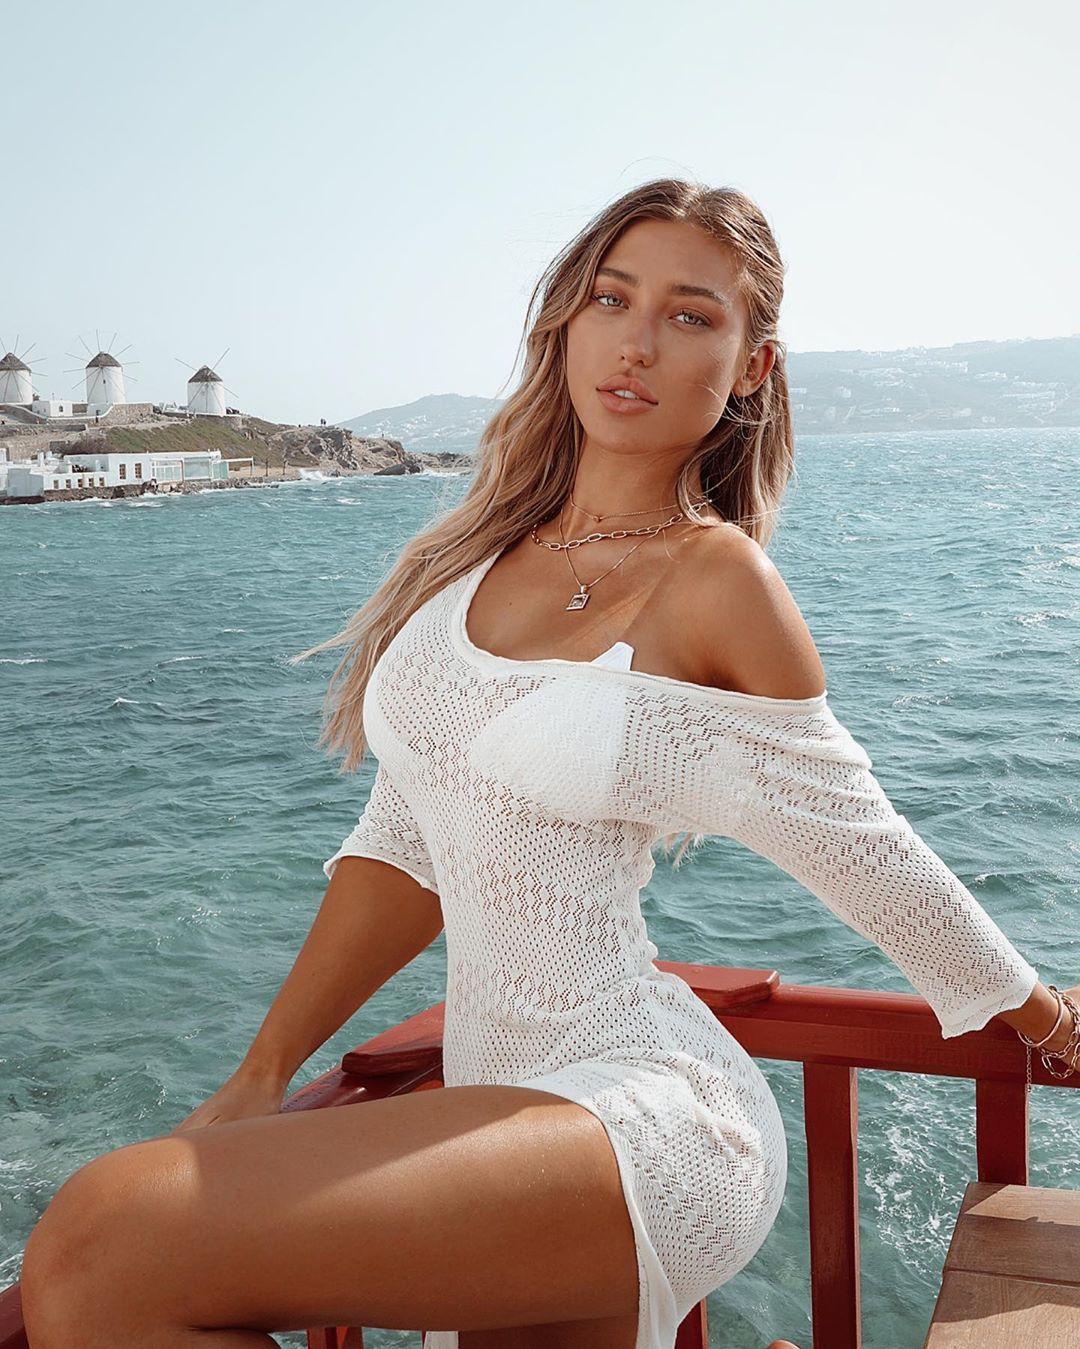 Stefanie-Gurzansk-Wallpapers-Insta-Fit-Bio-3